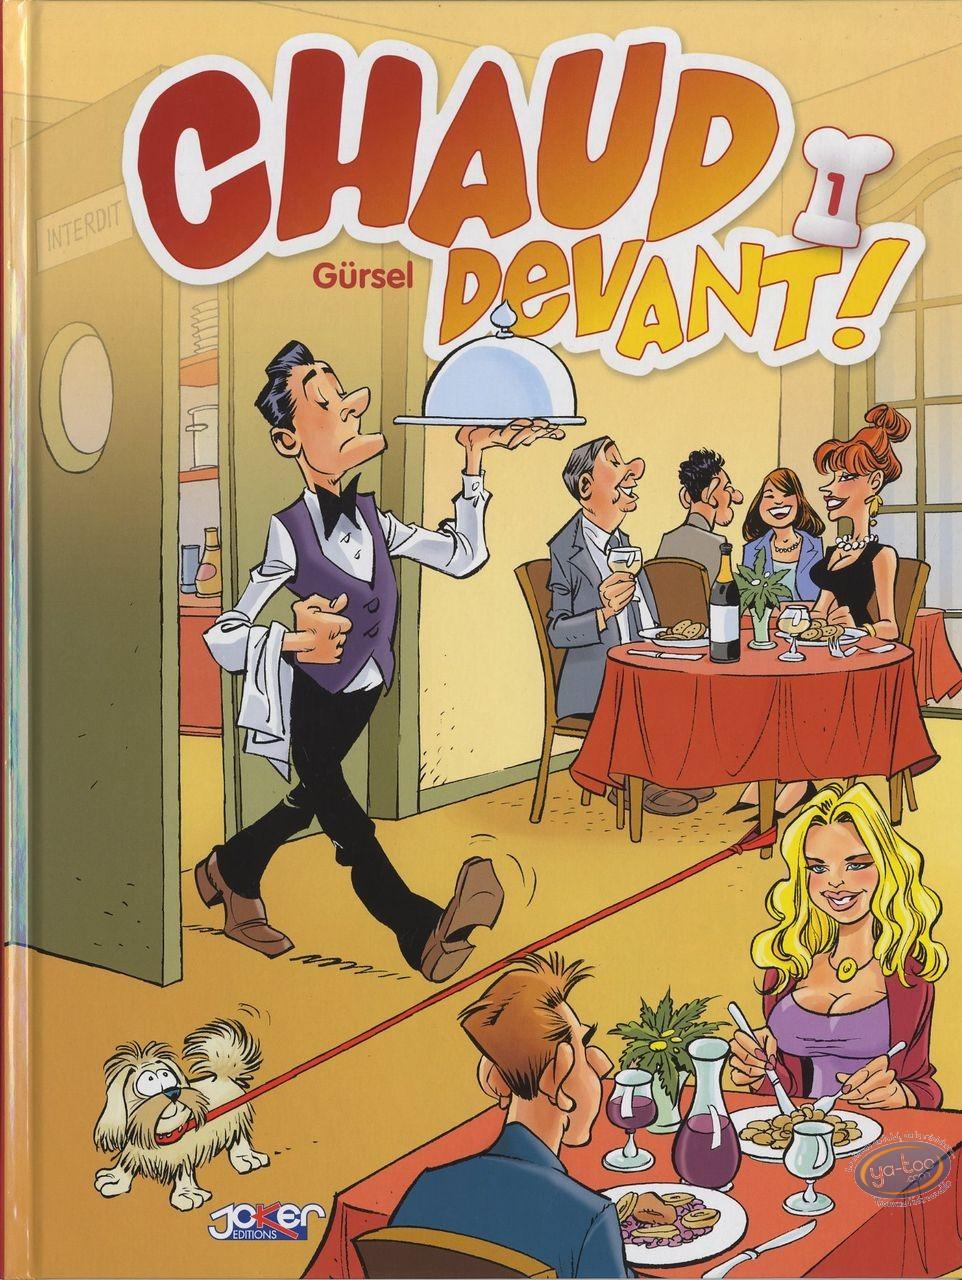 European Comic Books, Restauration (La) : Chaud devant